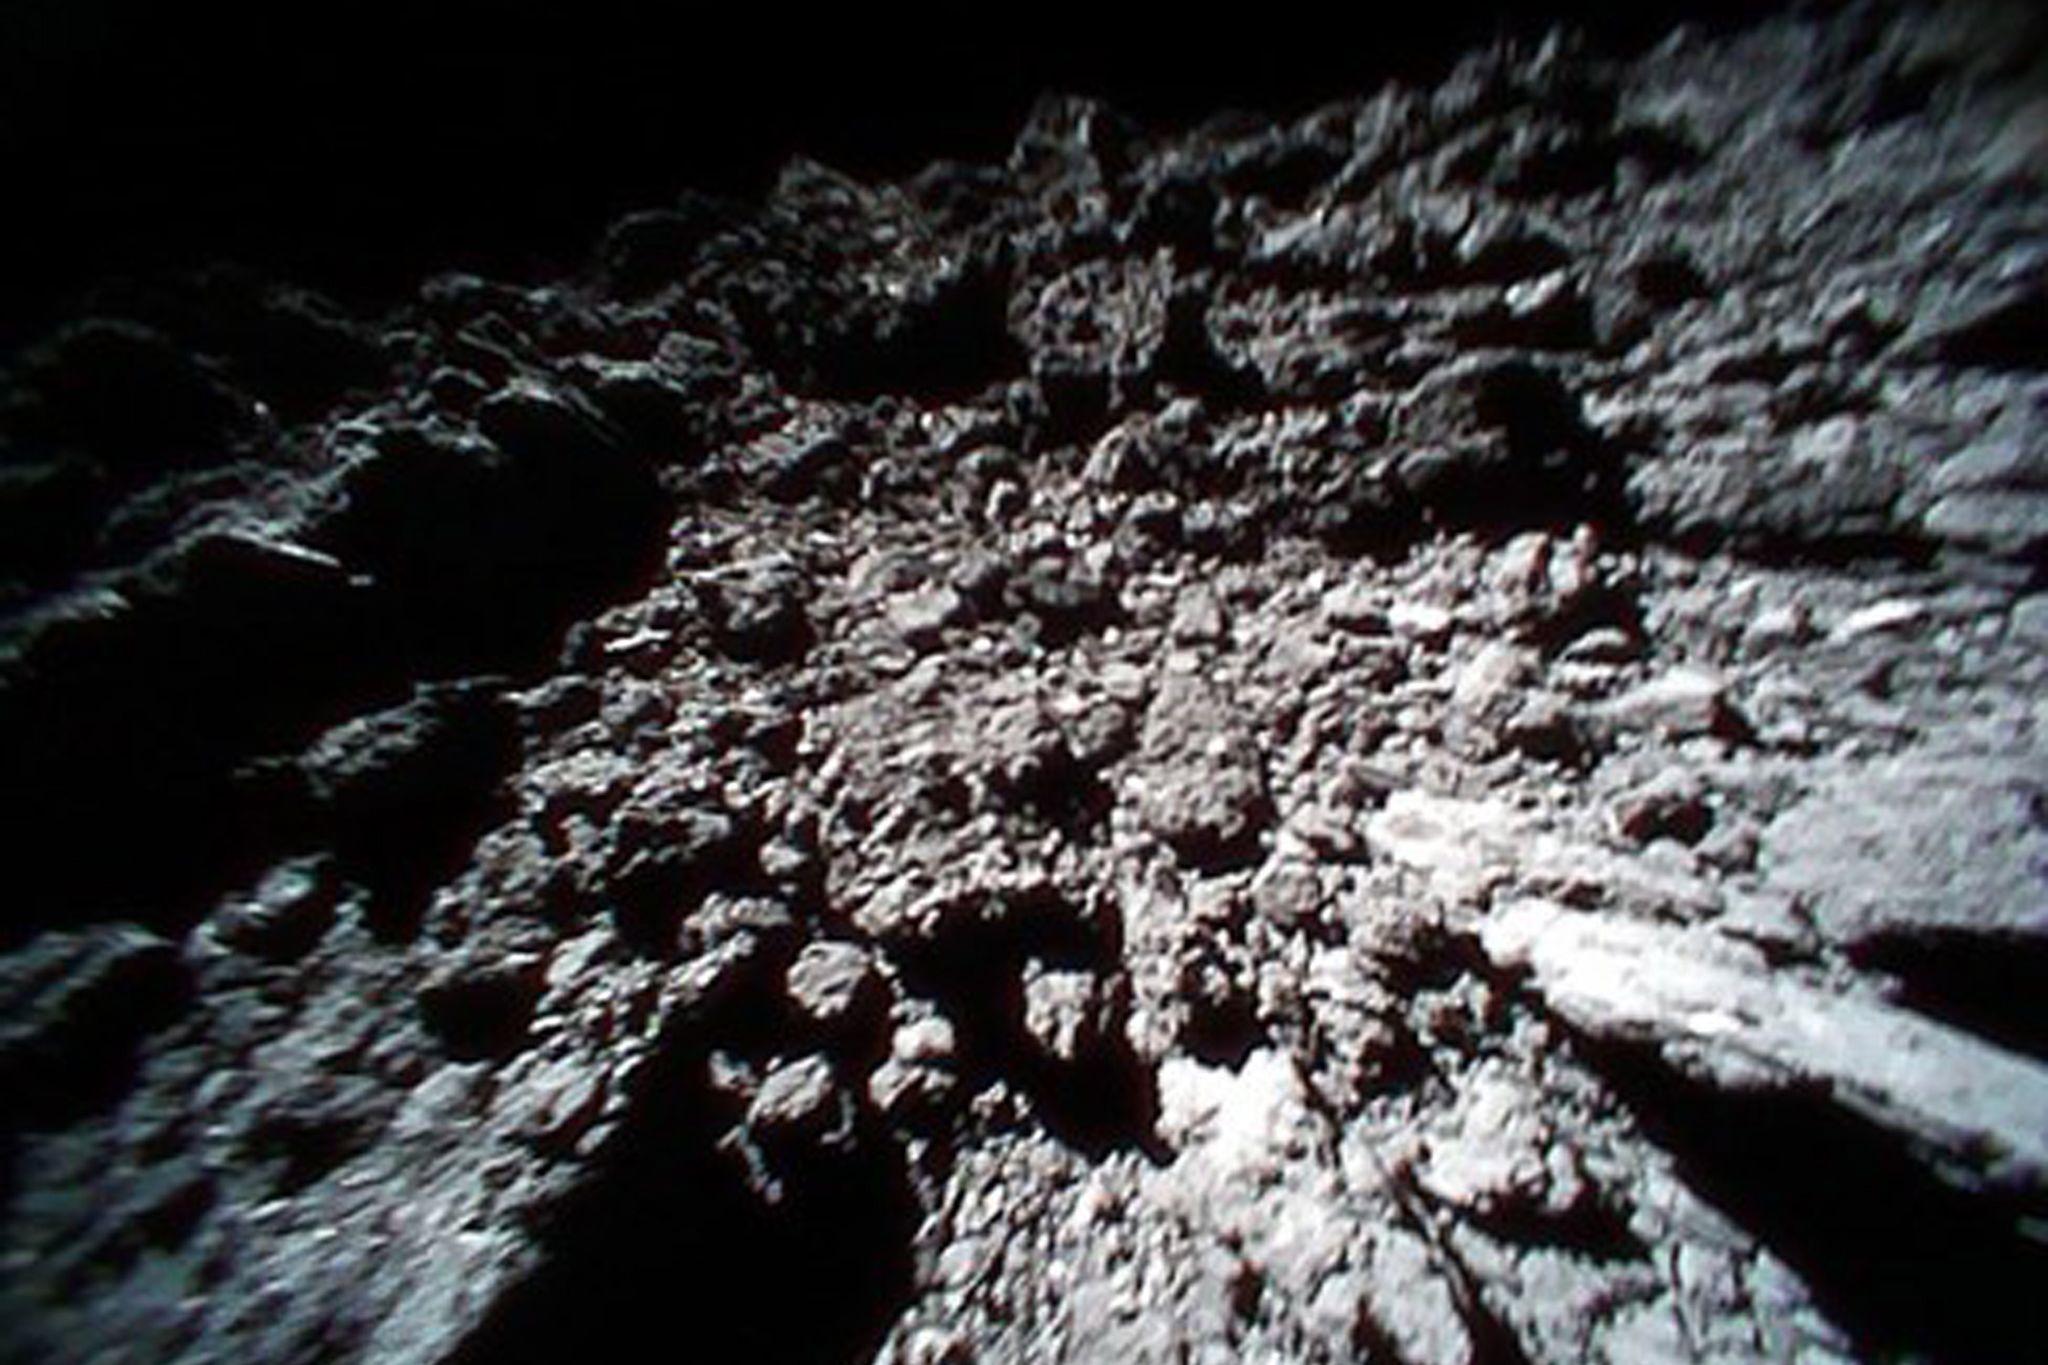 Sonda japonesa vai aterrissar em asteroide para recolher amostras